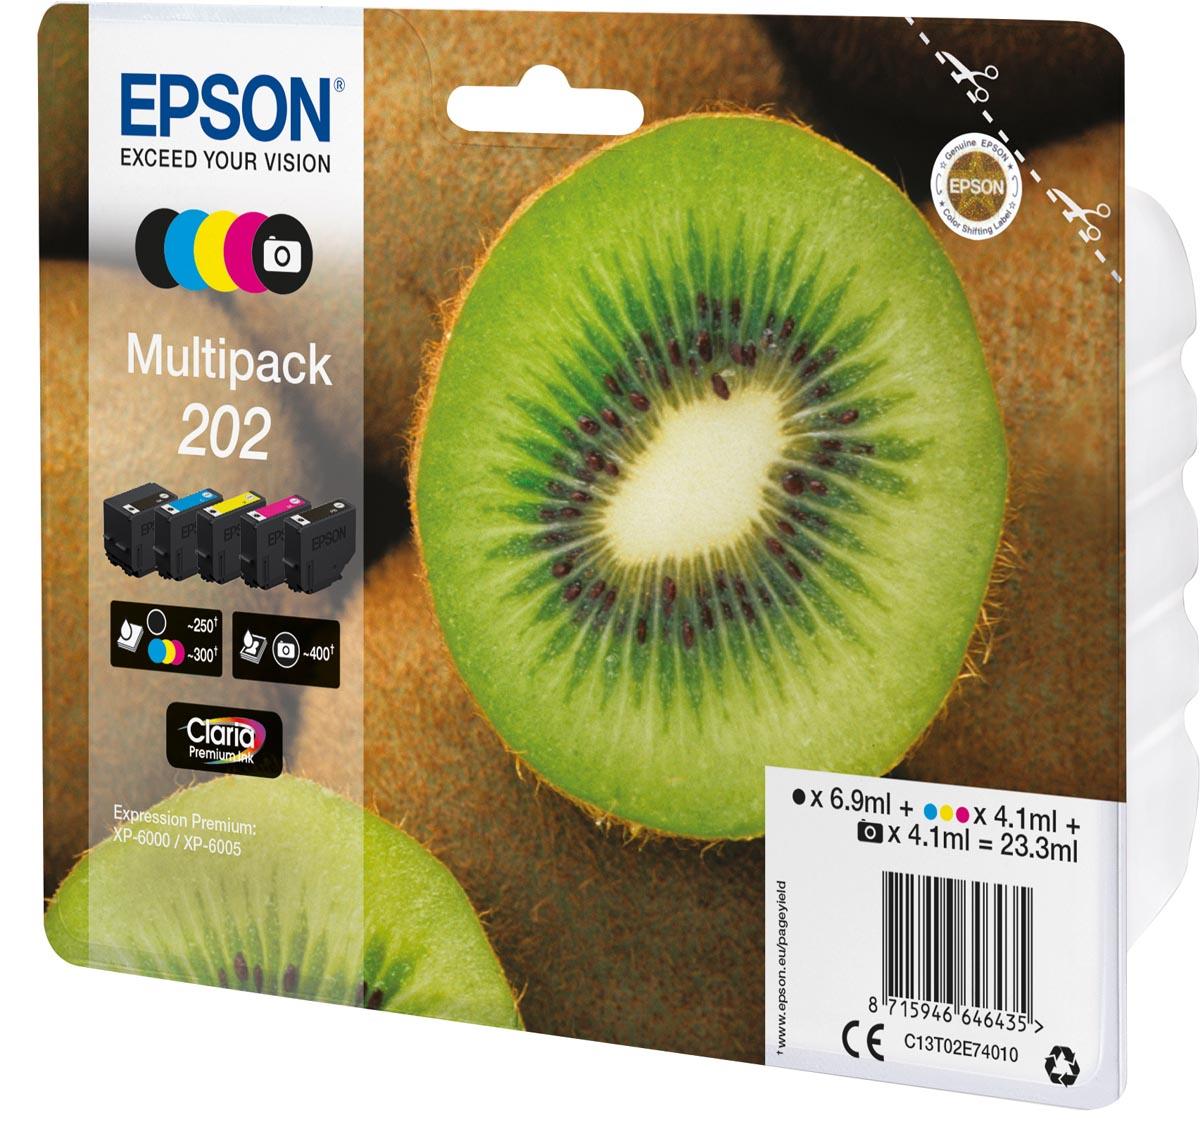 Epson inktcartridge 202, 250 - 400 pagina's, OEM C13T02E74010, 5 kleuren